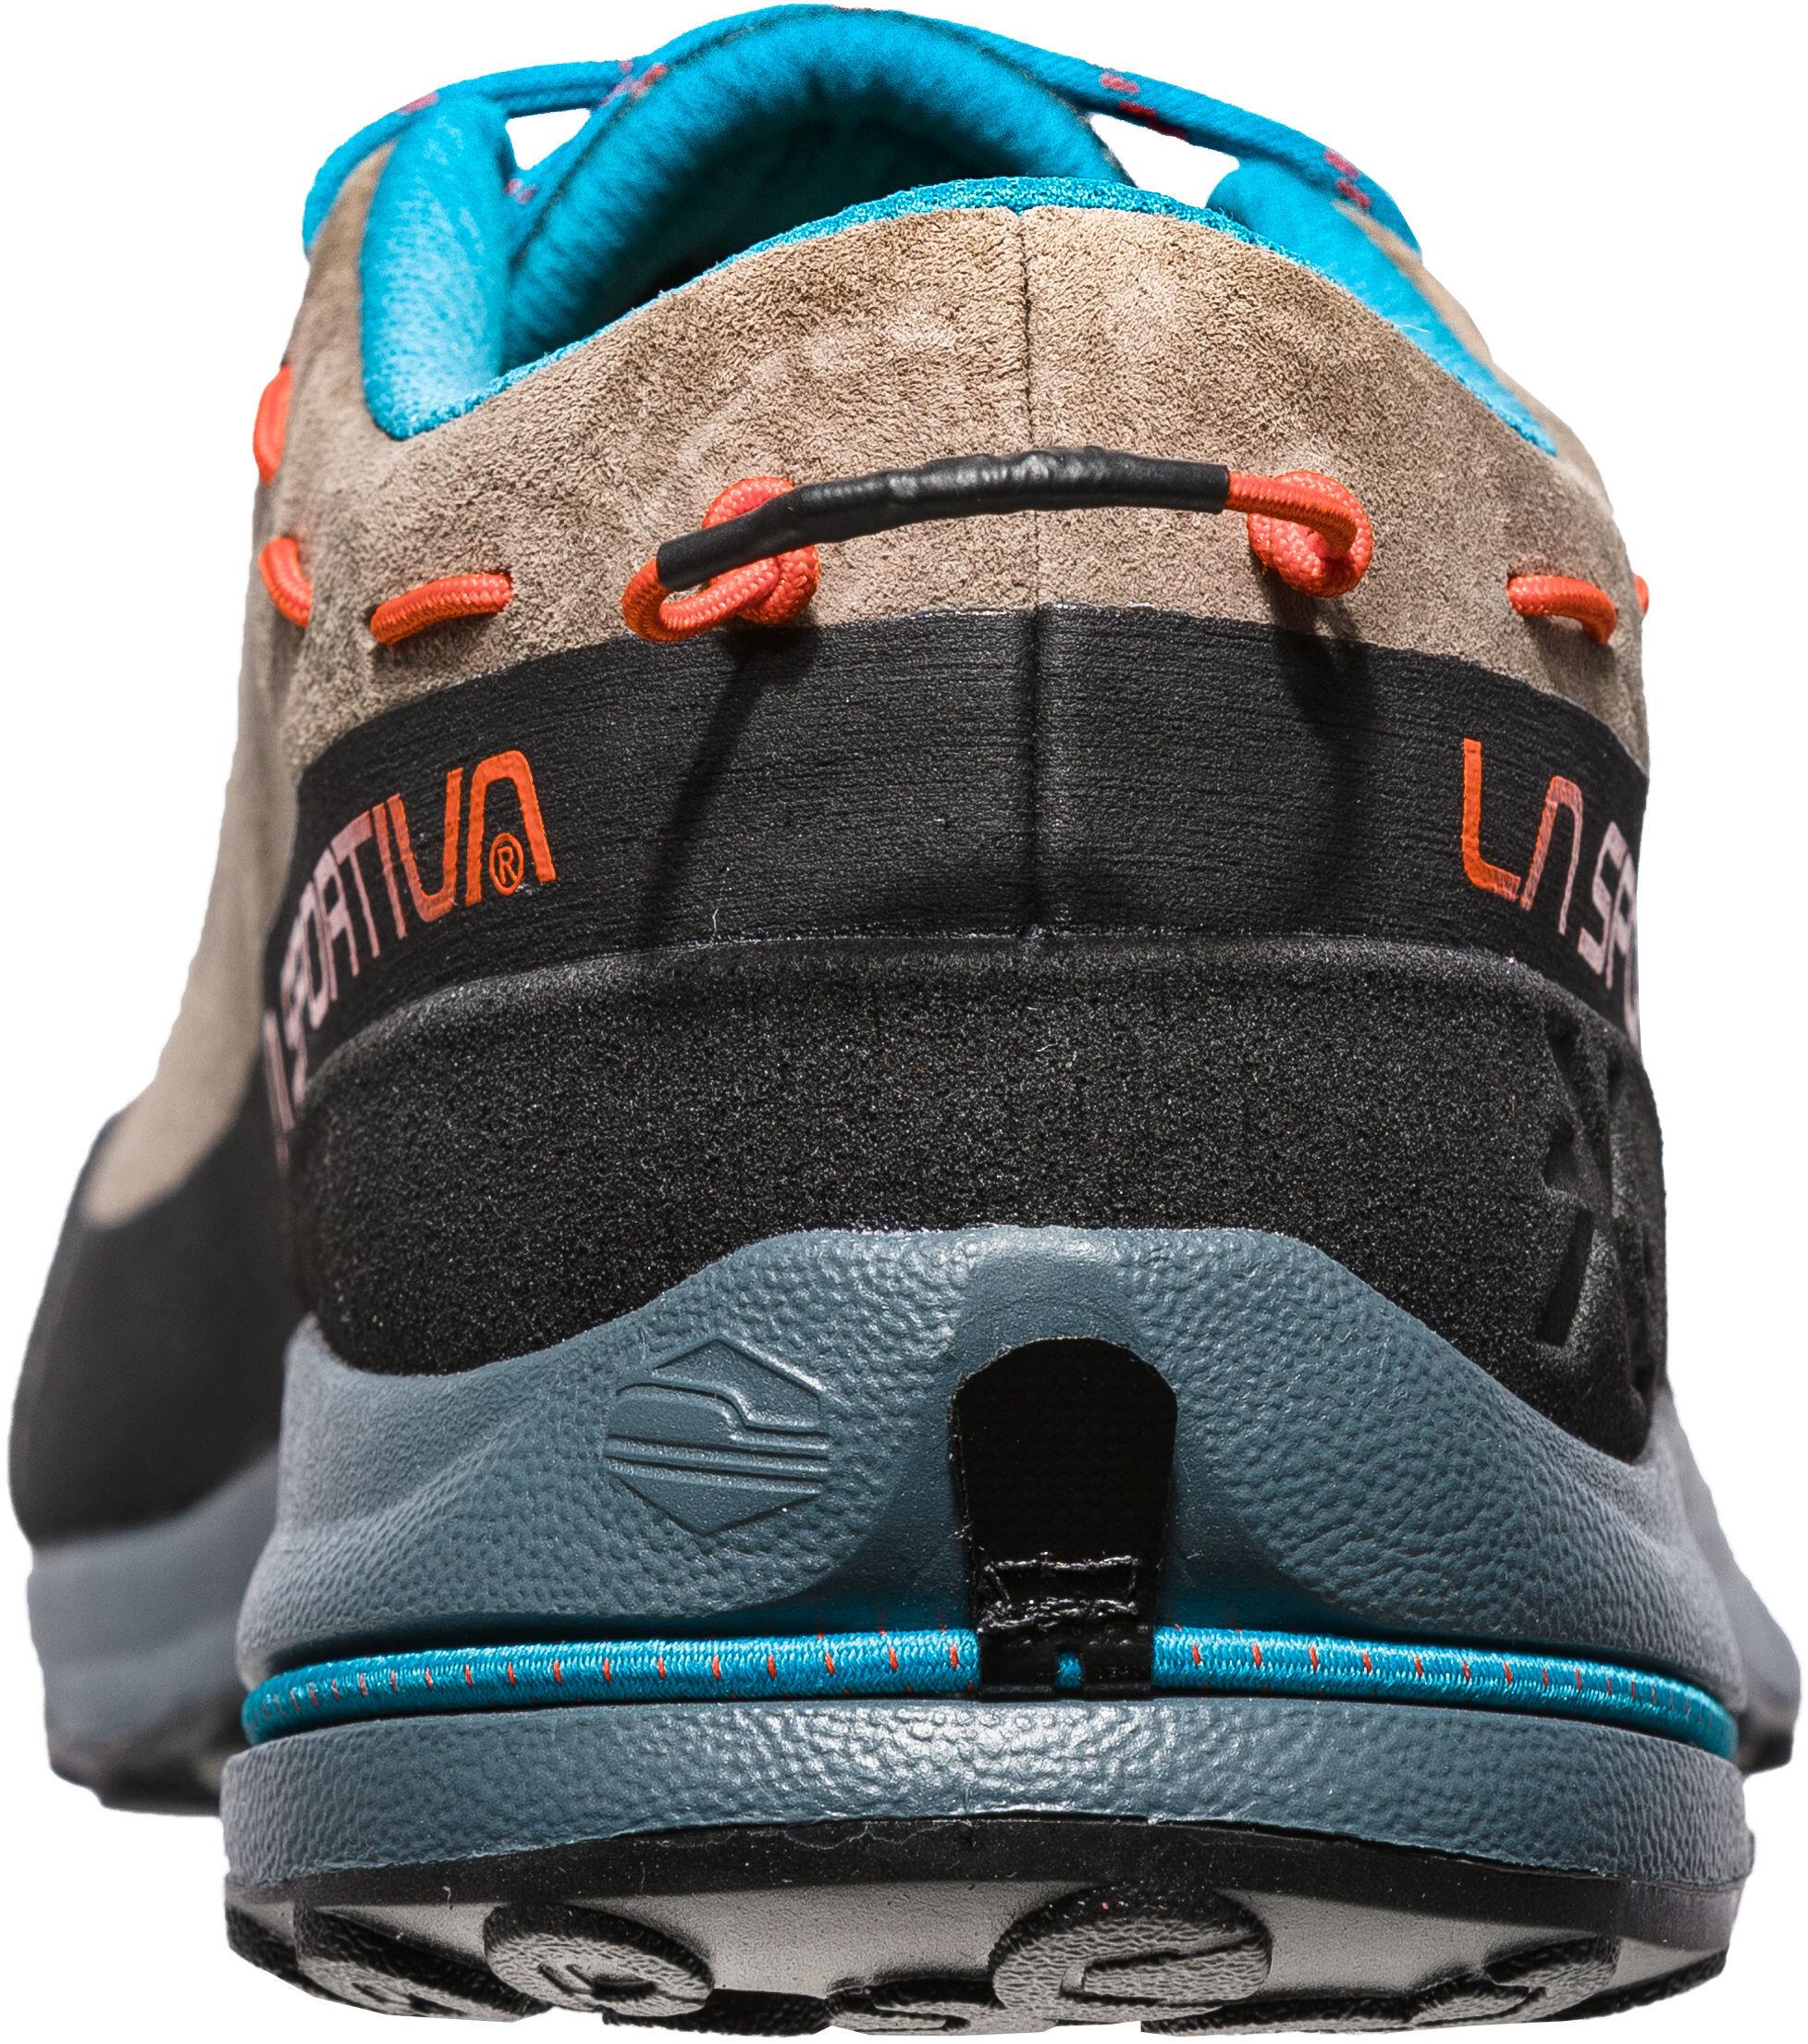 9f08e2d63358 La Sportiva TX2 Leather Shoes Men brown at Addnature.co.uk